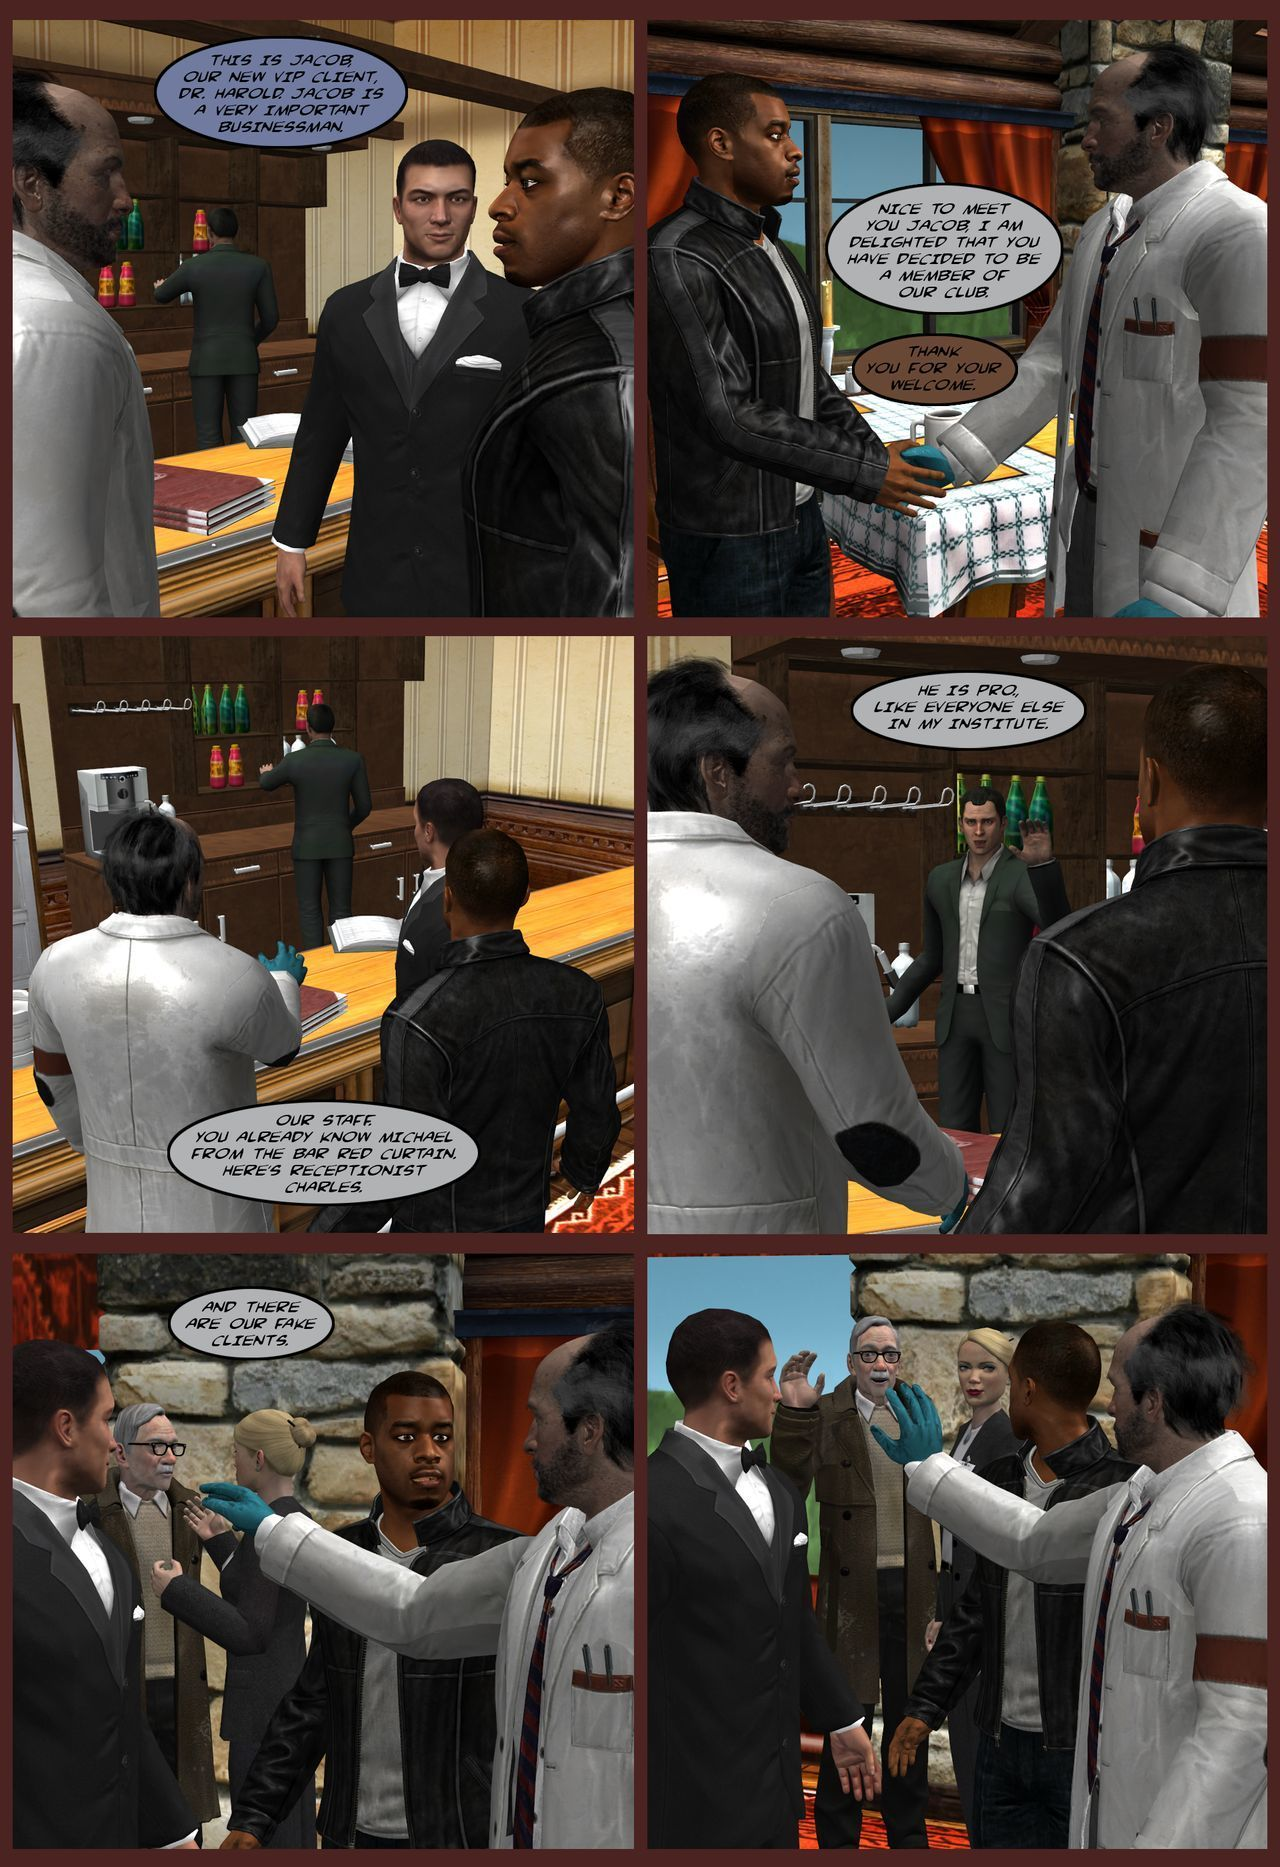 Adventures of Hostel - chapter 1-2 - part 2